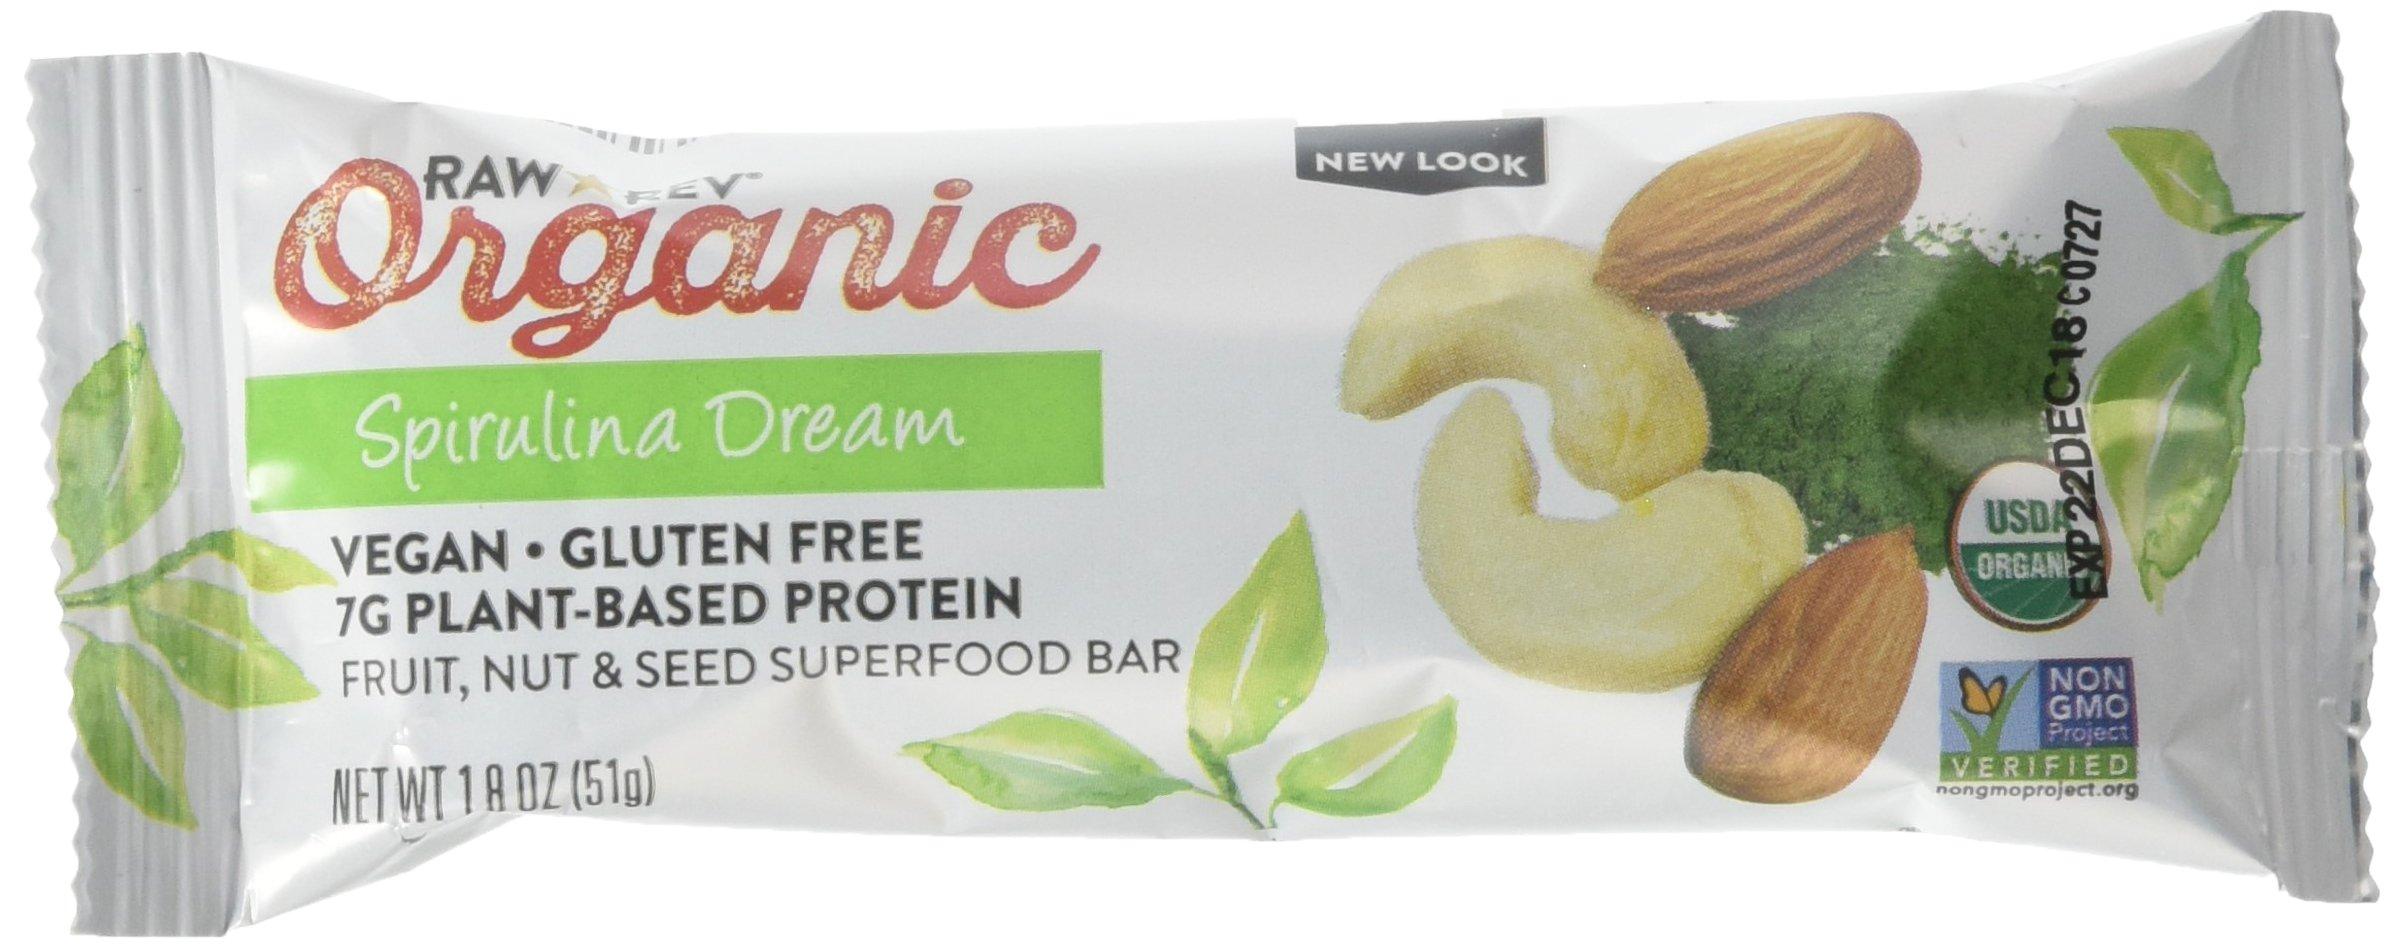 Raw Rev Organic Superfood Bar, Spirulina Dream, 1.8 Ounce Bar (Pack of 12) 7g Protein, 2g Fiber, Vegan, Raw, Organic, Plant-Based, Gluten-Free, Fruit, Nut, & Seed Bars